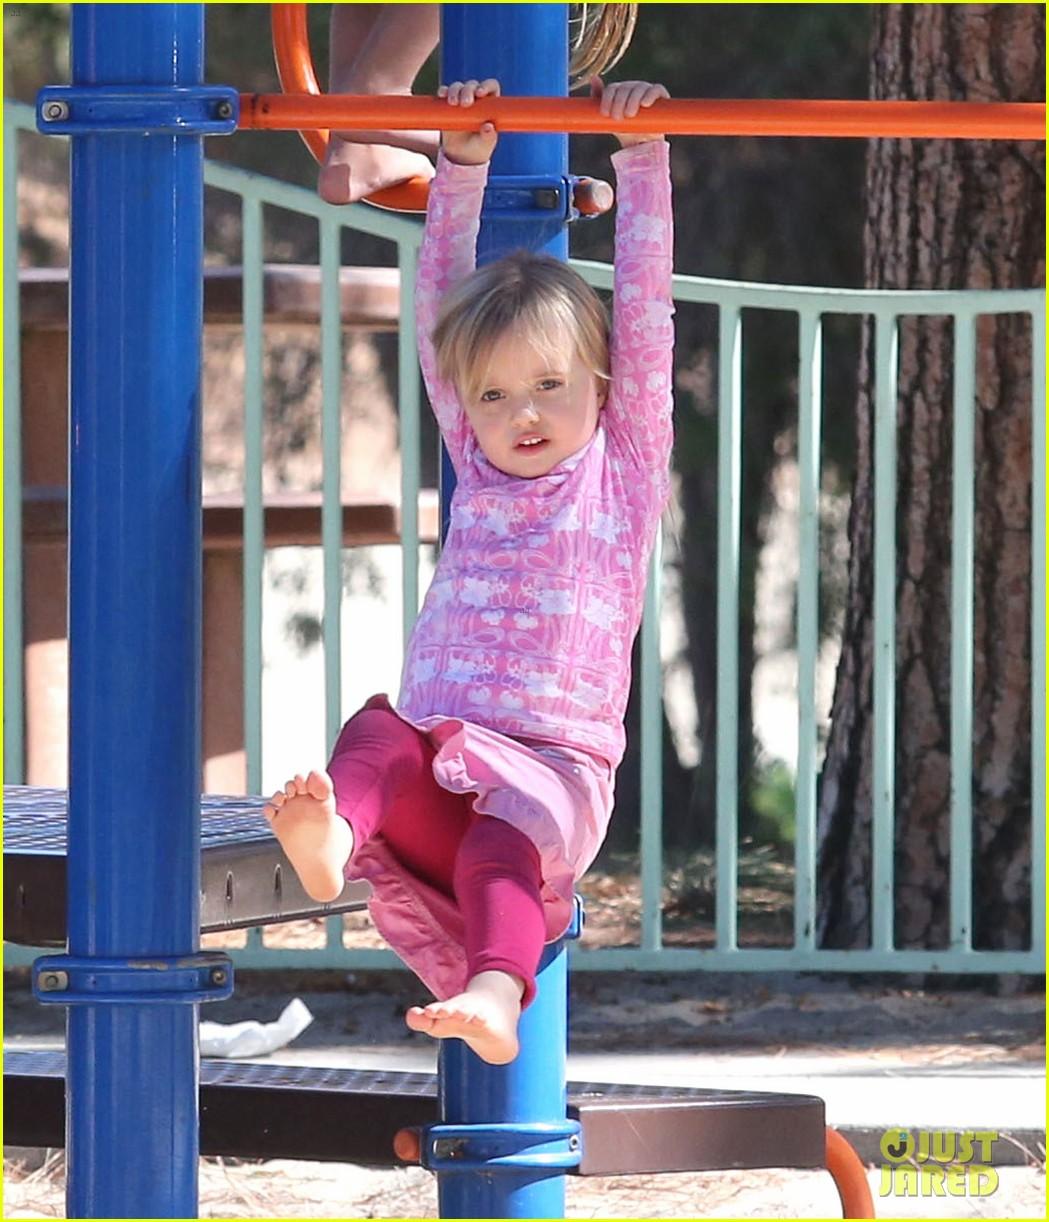 http://2.bp.blogspot.com/-TguKfOZ9Z1k/UI0pkTcFEwI/AAAAAAAAKV0/KNuLLLhdin0/s1600/angelina-jolie-park-playtime-with-knox-vivienne-17.jpg